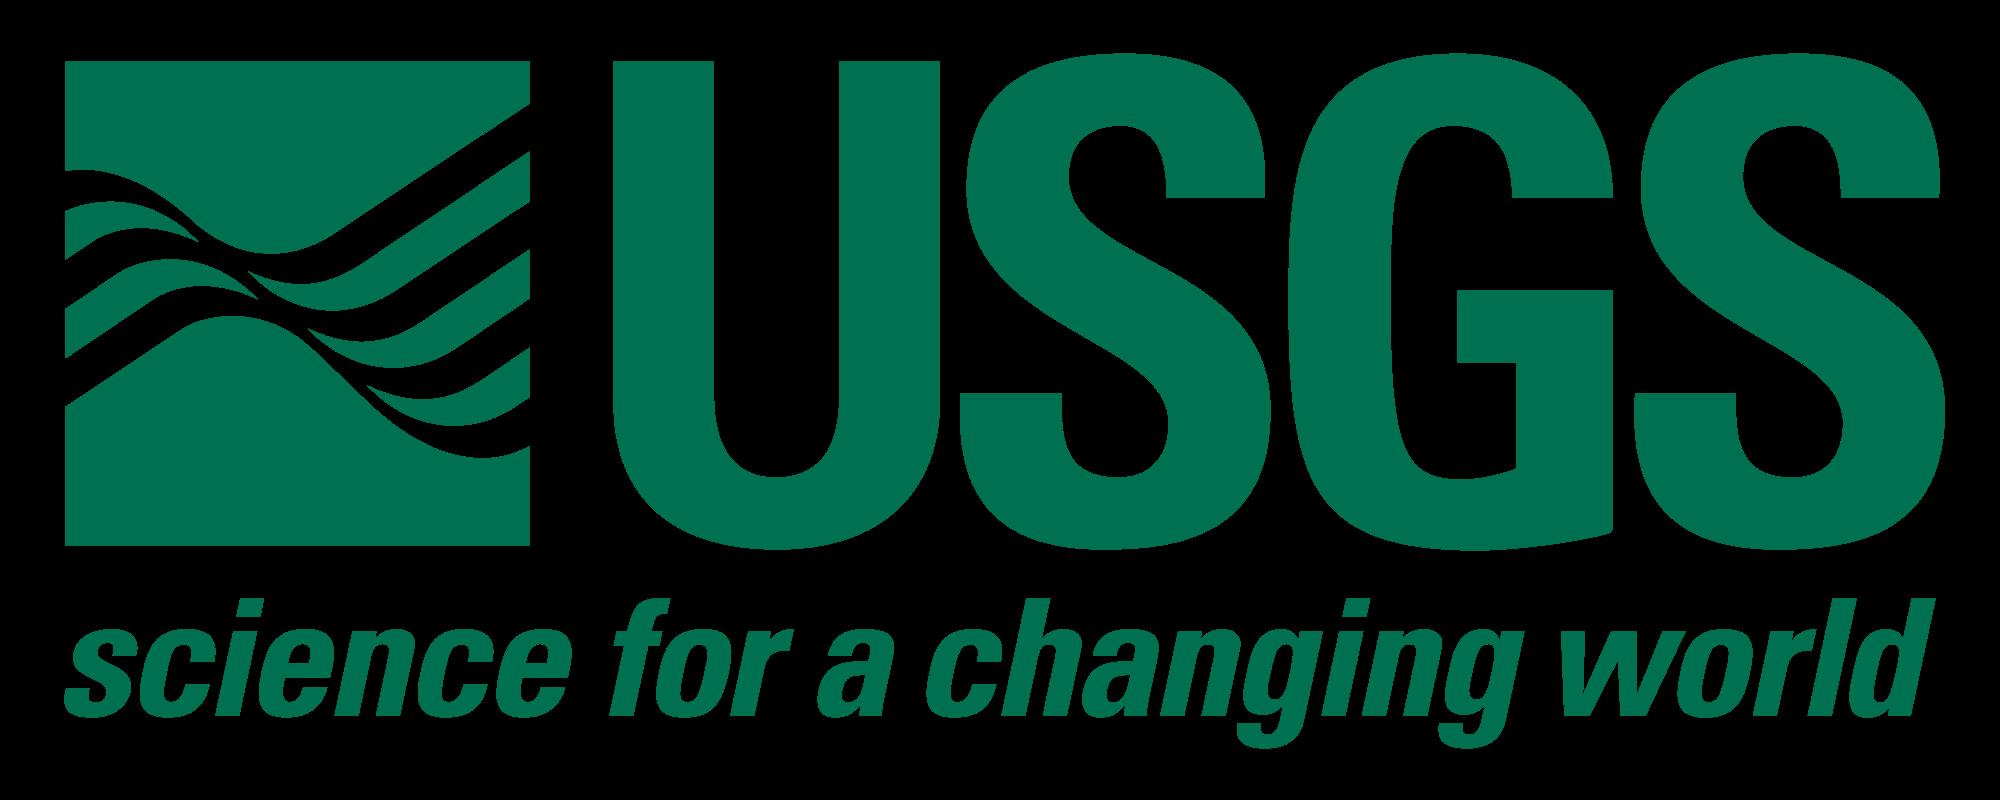 2000px-USGS_logo_green.svg